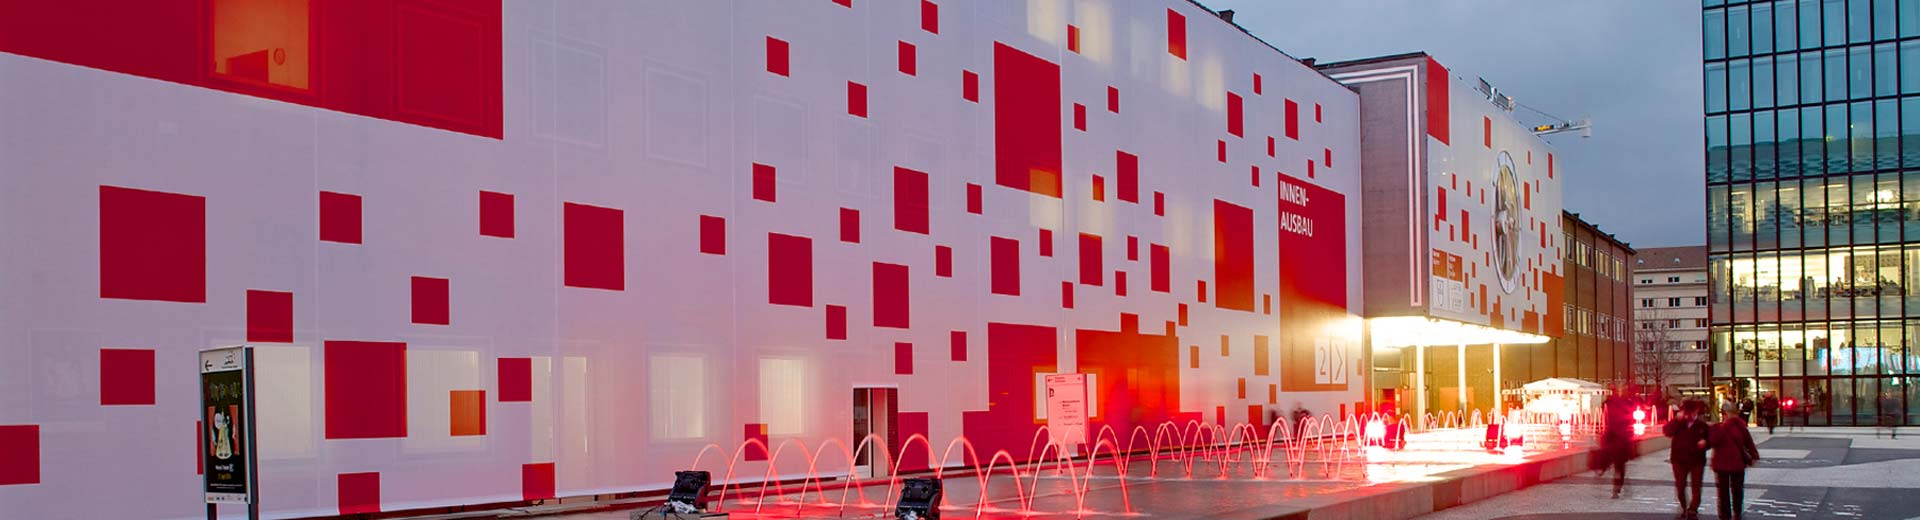 Swissbau Architektur Messe 3D-Keramik